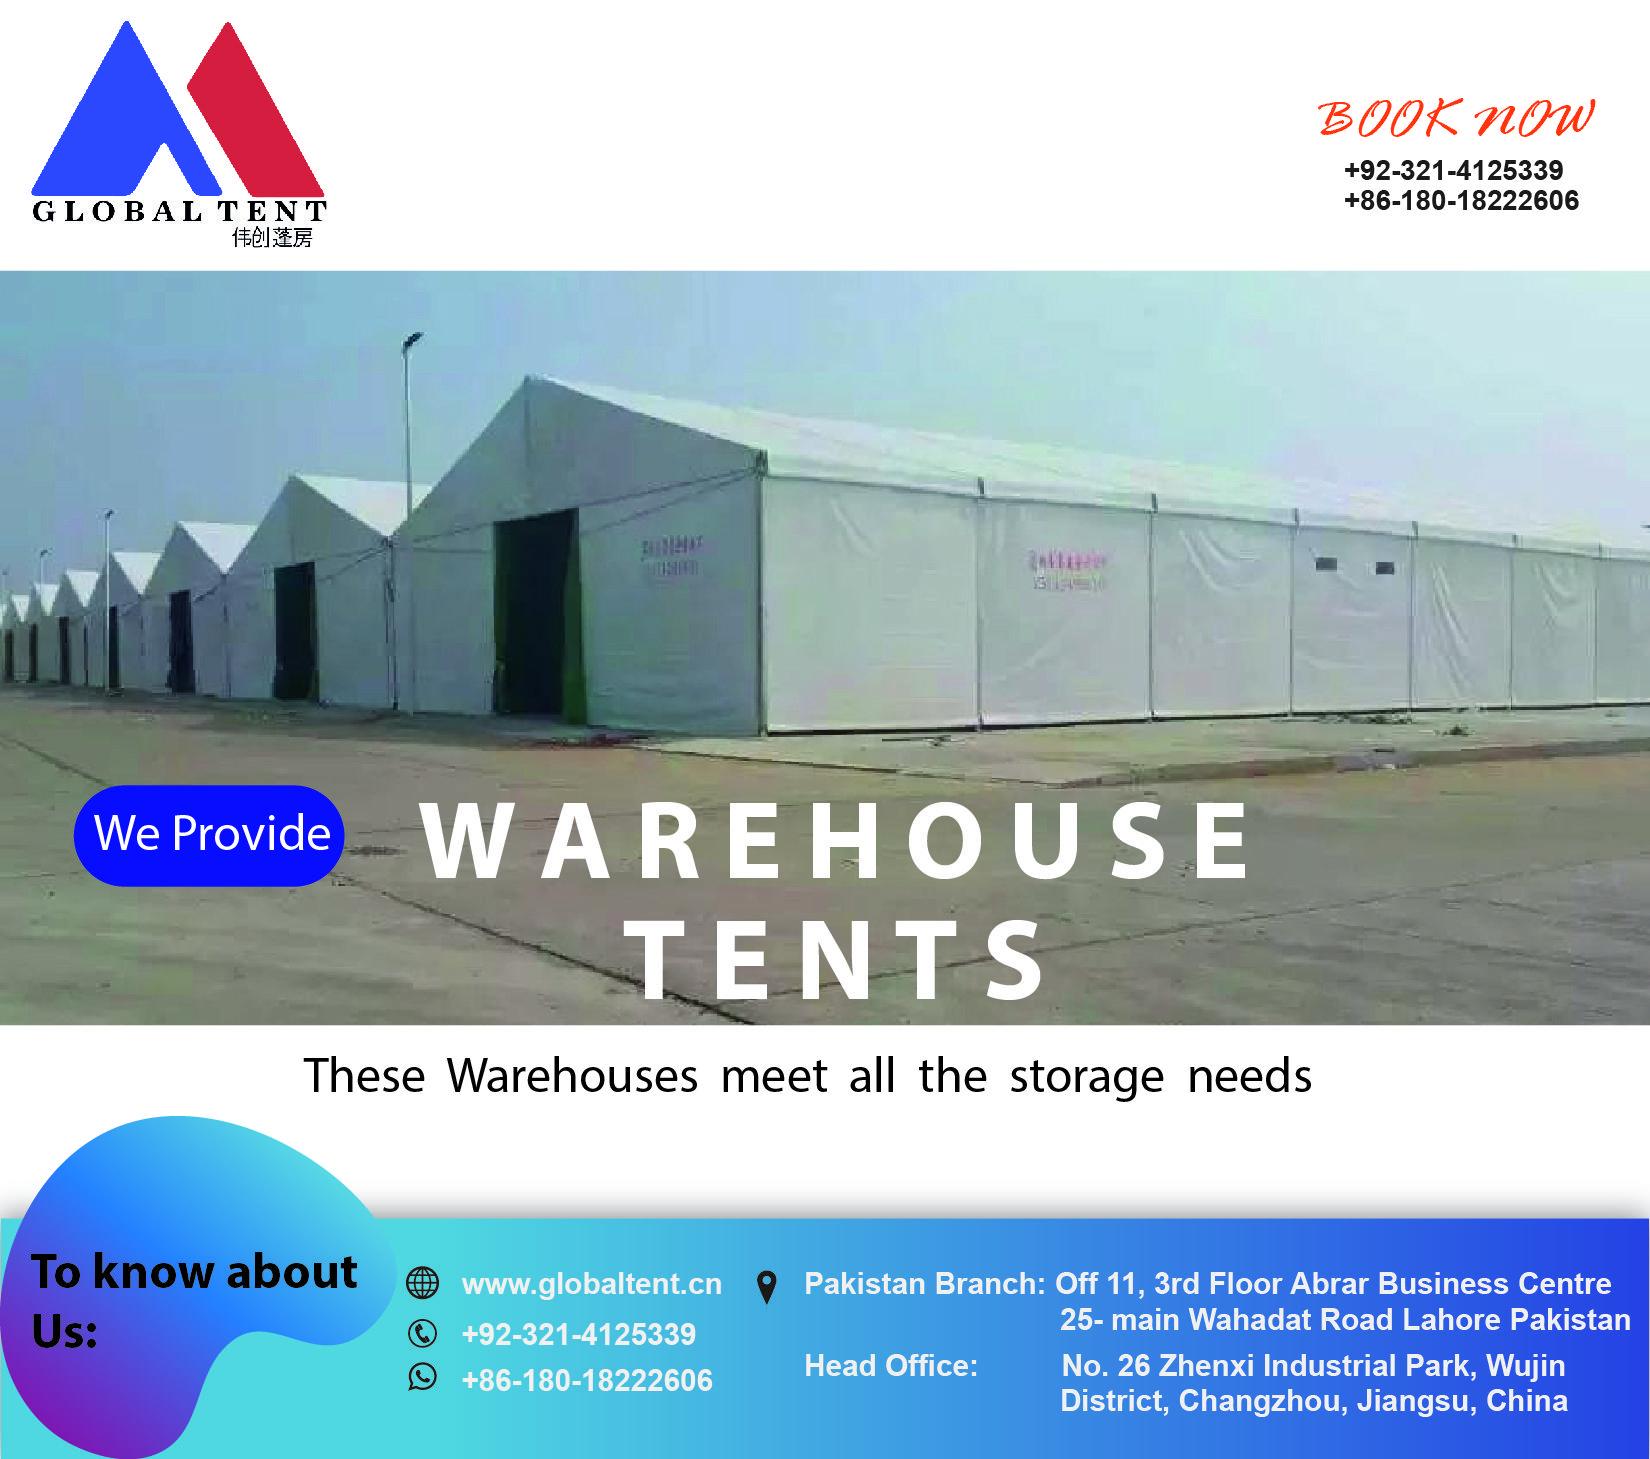 globaltent warehousetent aluminum marquee Tent